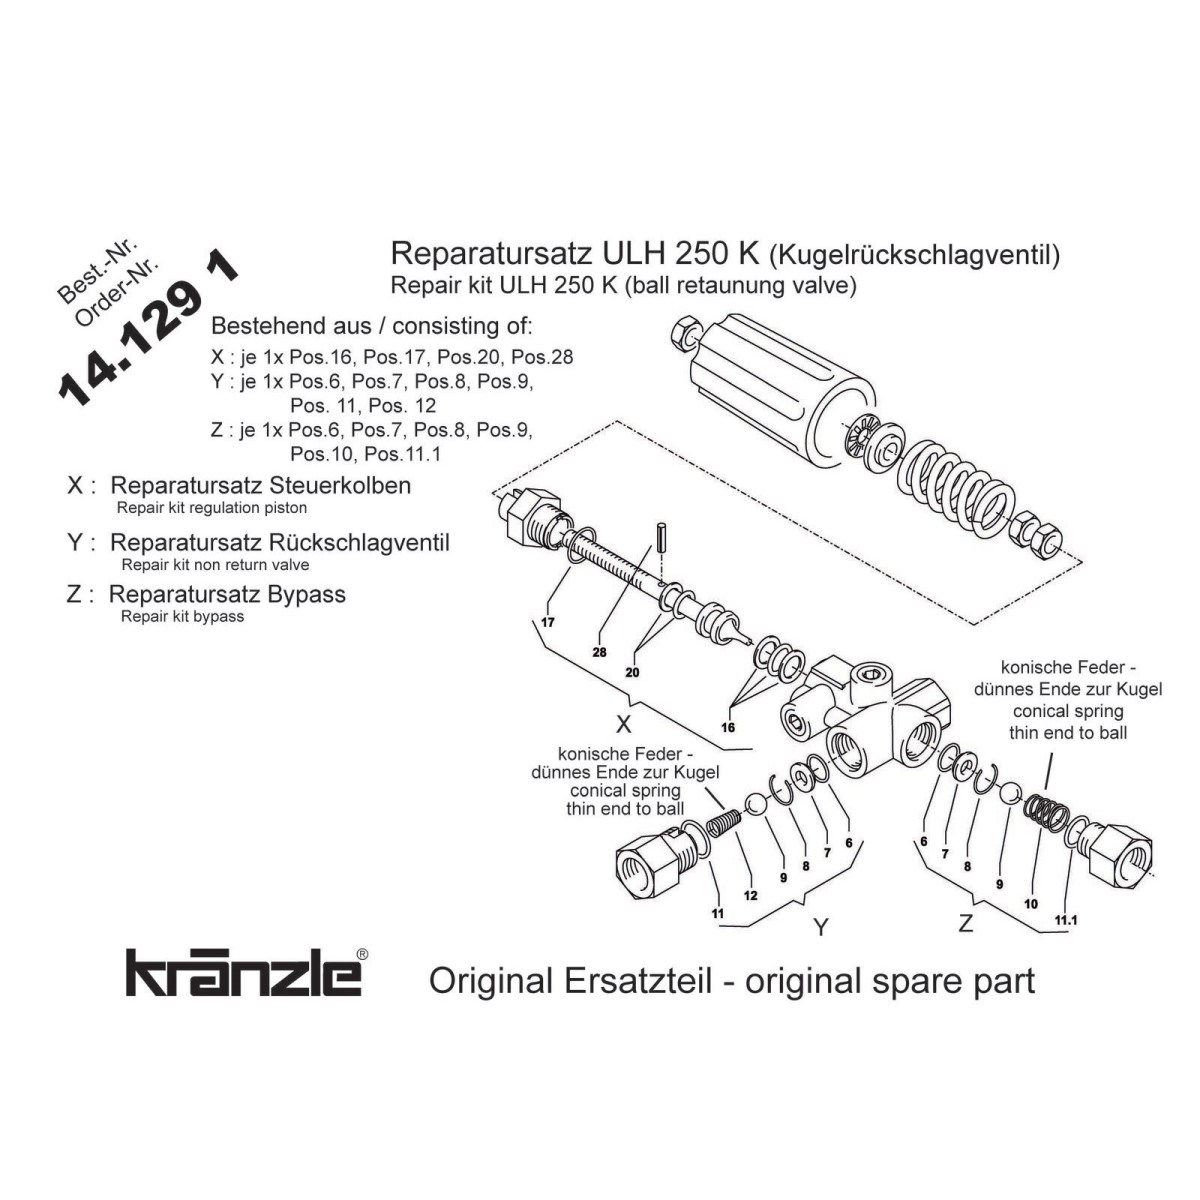 141291 - Repair Kit Regulation Piston with Ball +amp Spring